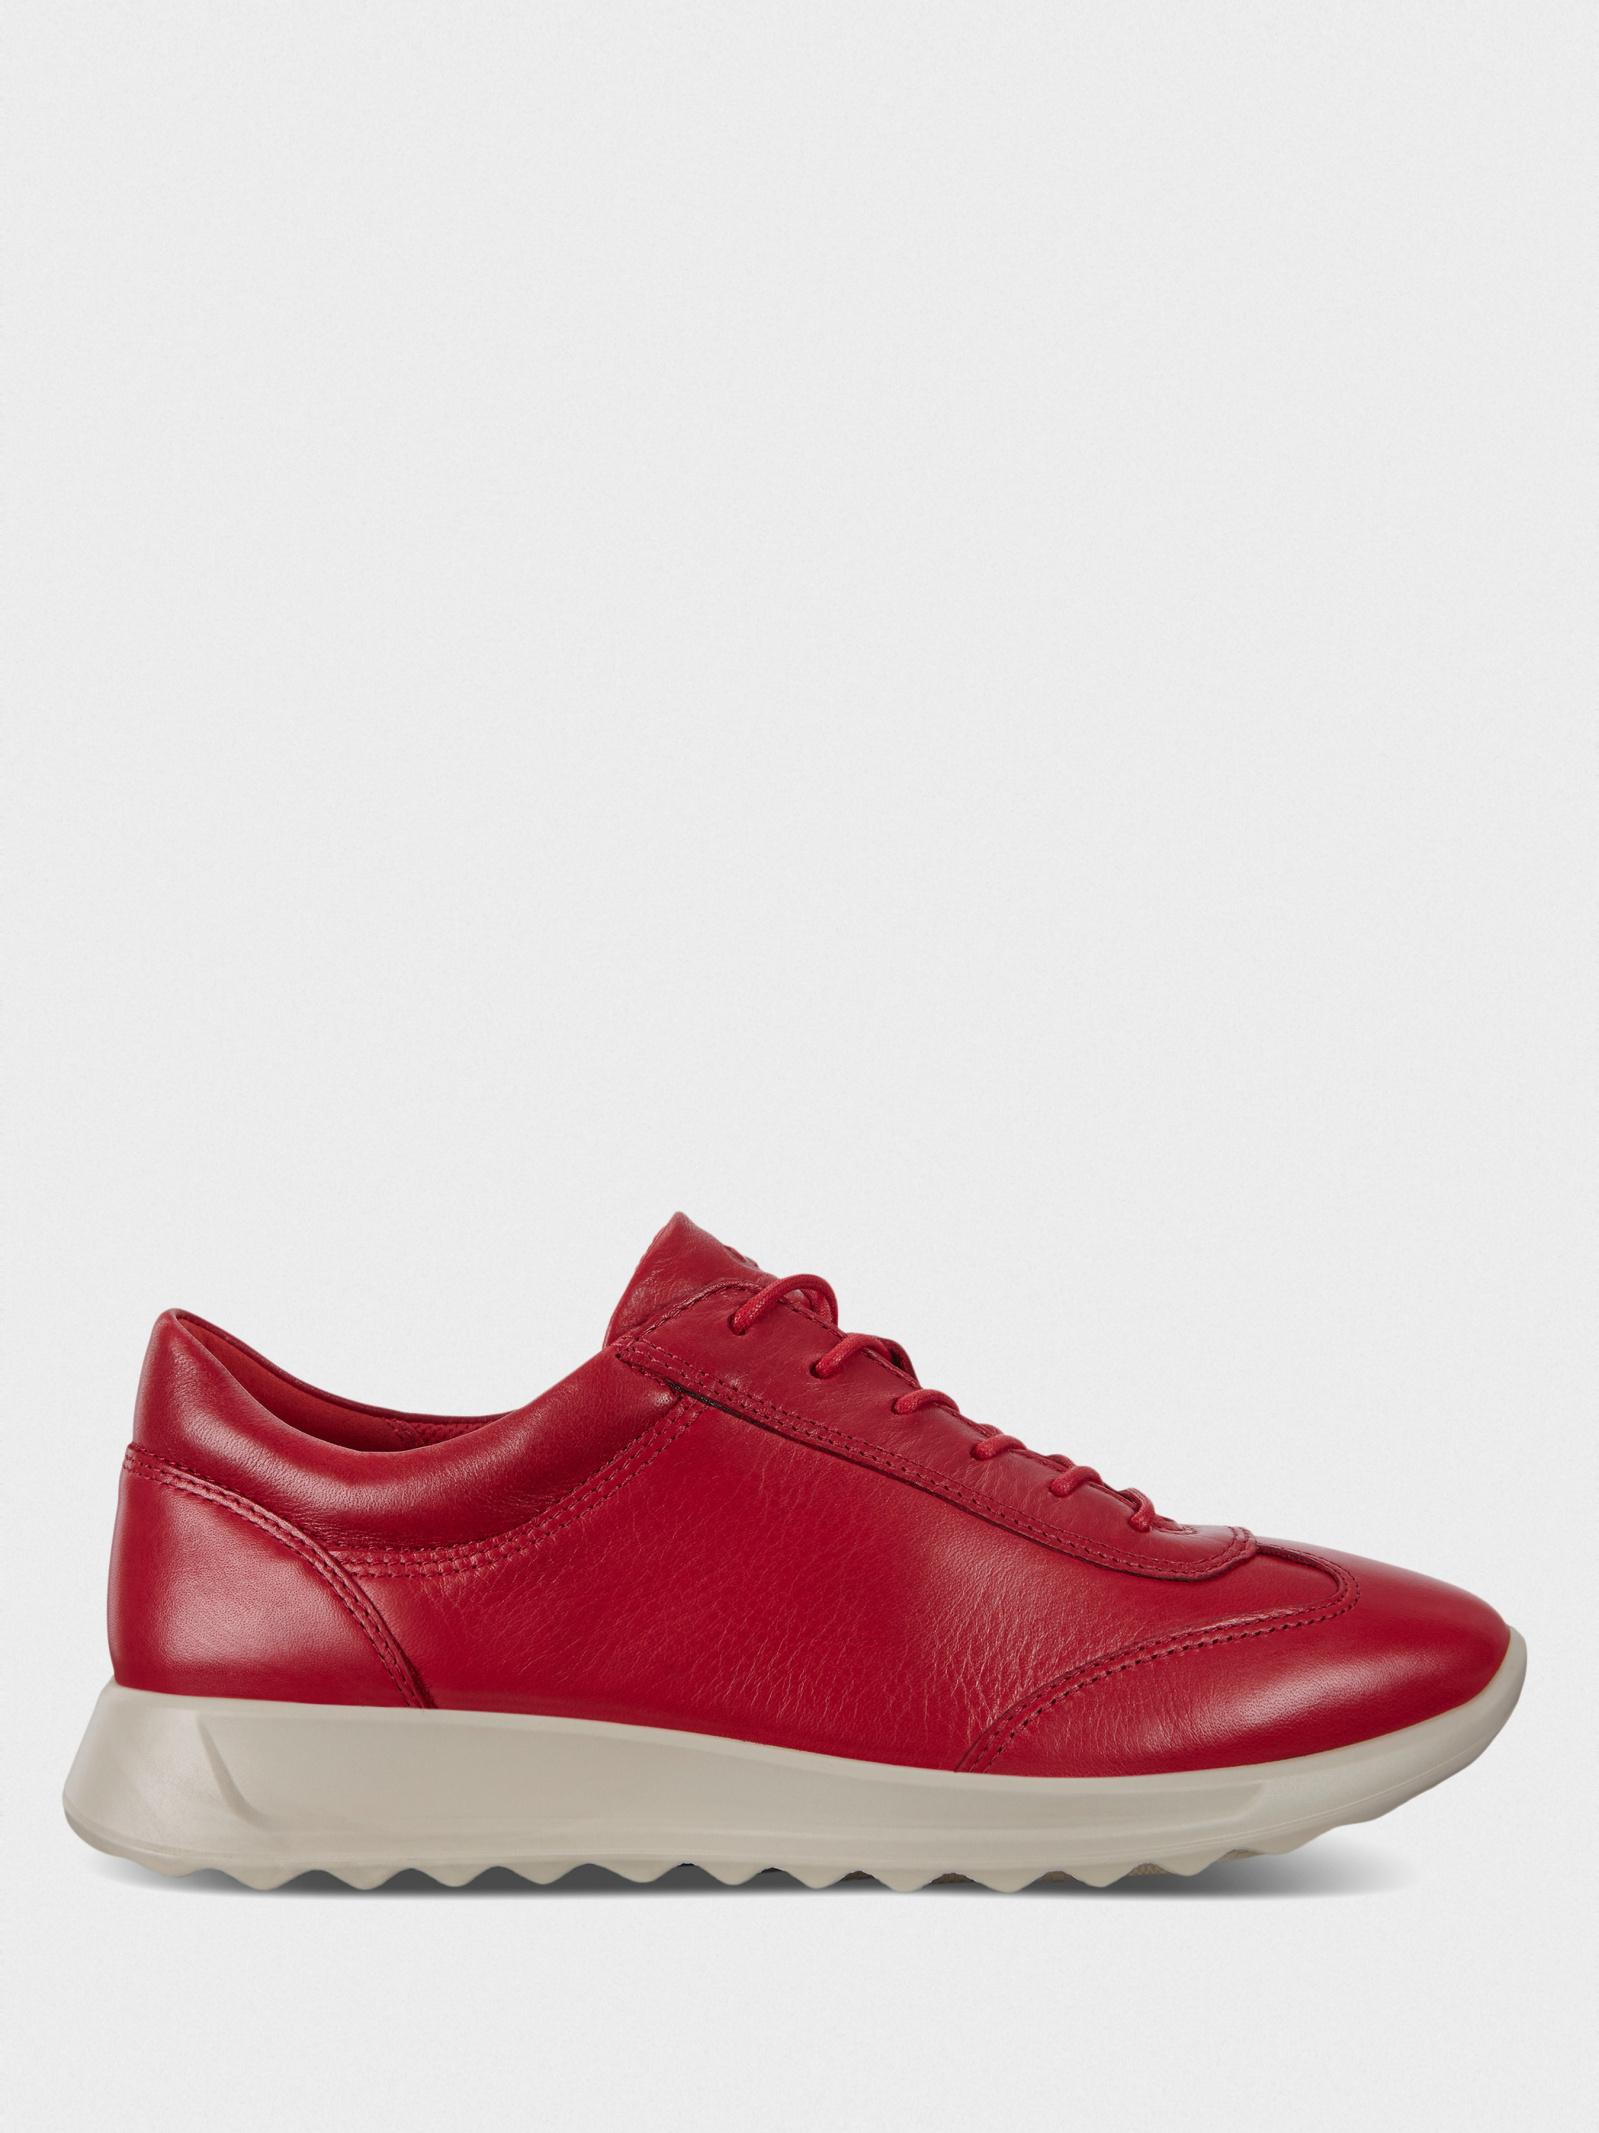 Кросівки  для жінок ECCO FLEXURE RUNNER W 292333(01466) модне взуття, 2017